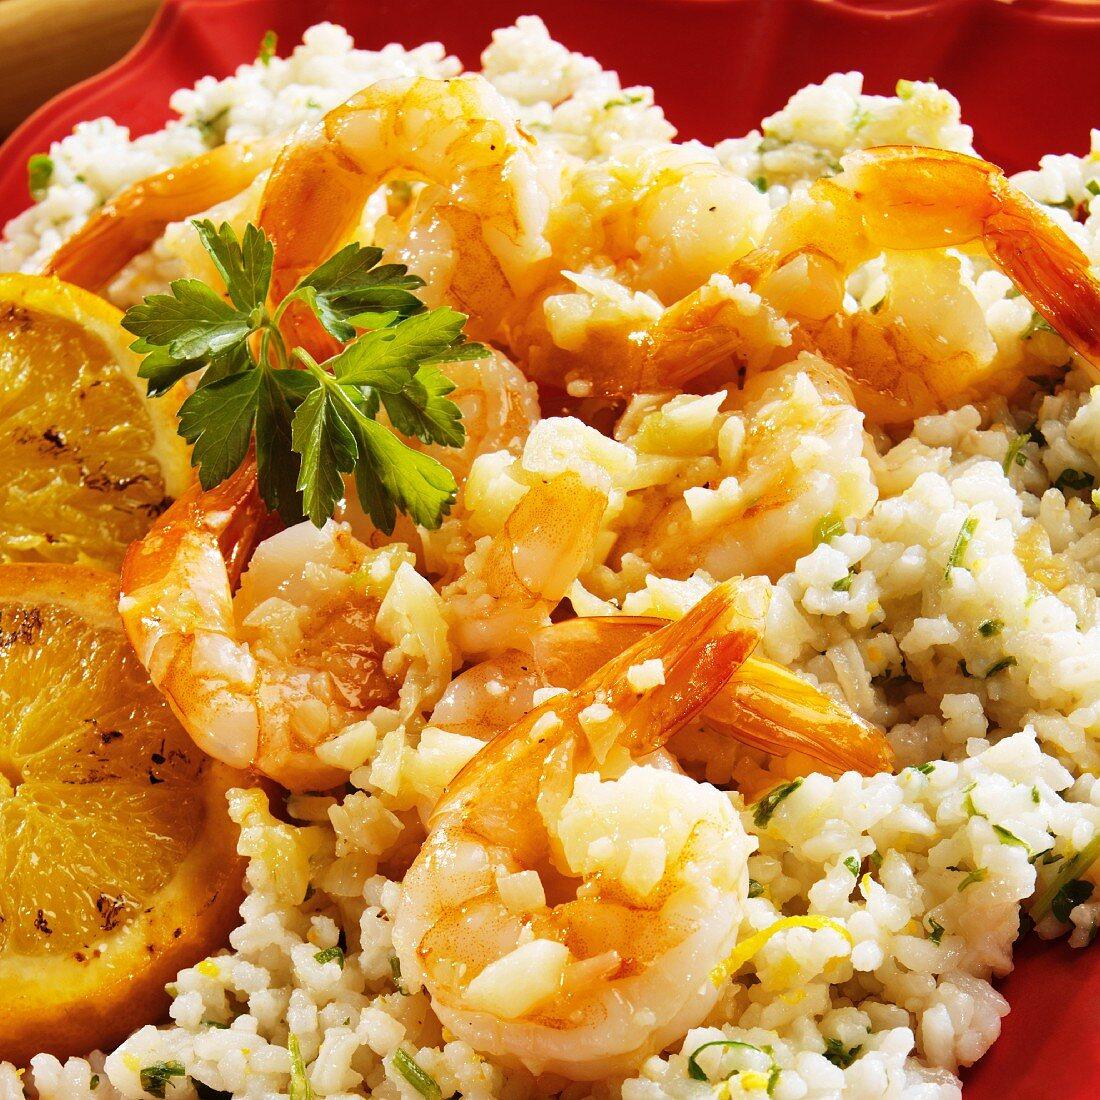 Garlic Sauteed Shrimp on Orange Infused Rice